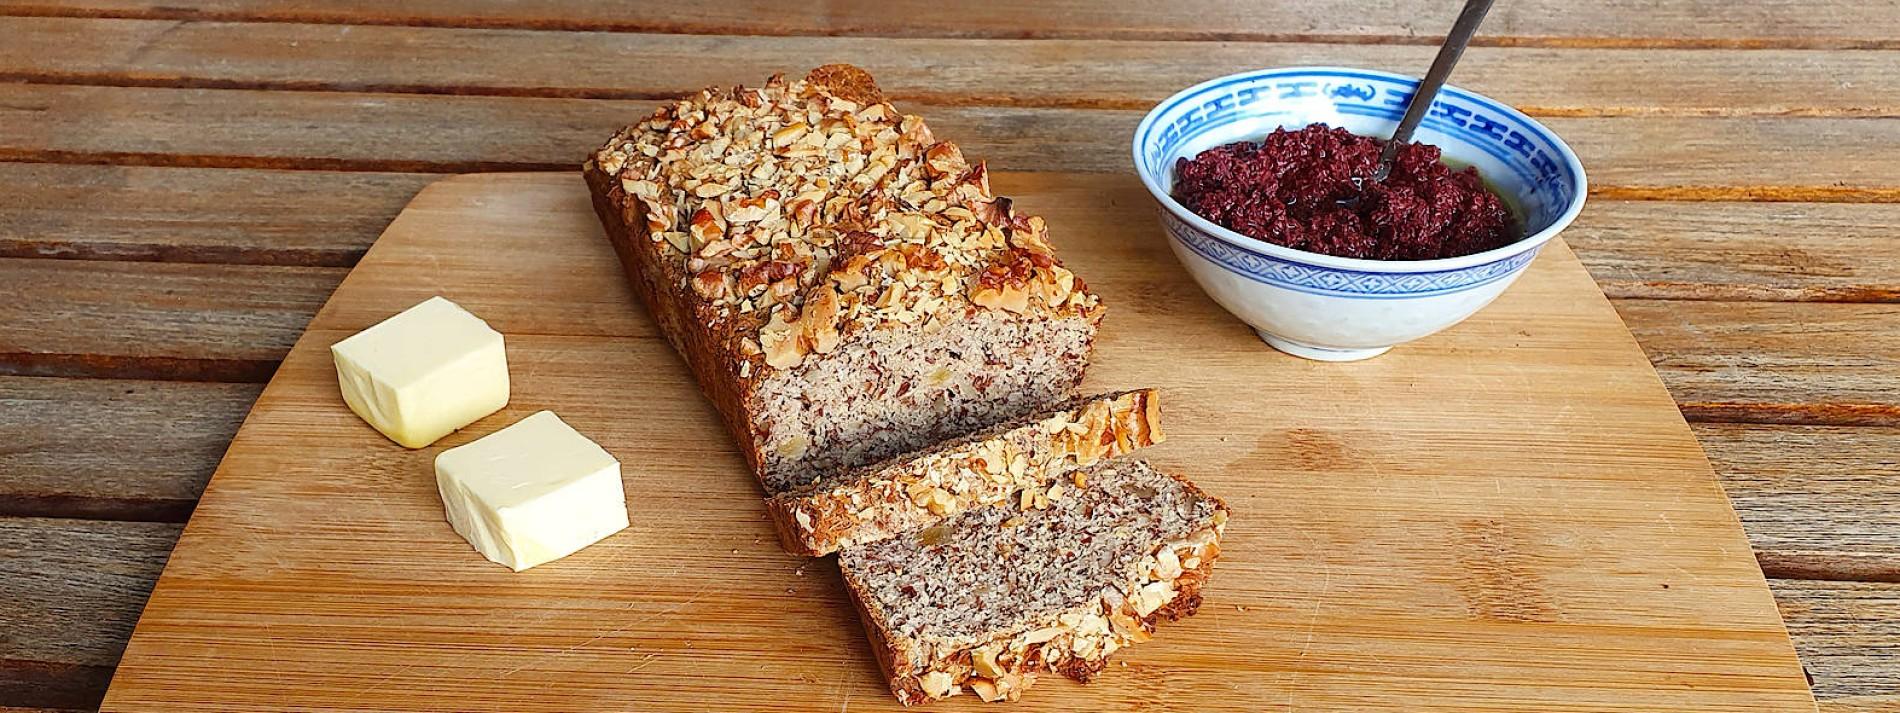 Brot als Hirnfutter